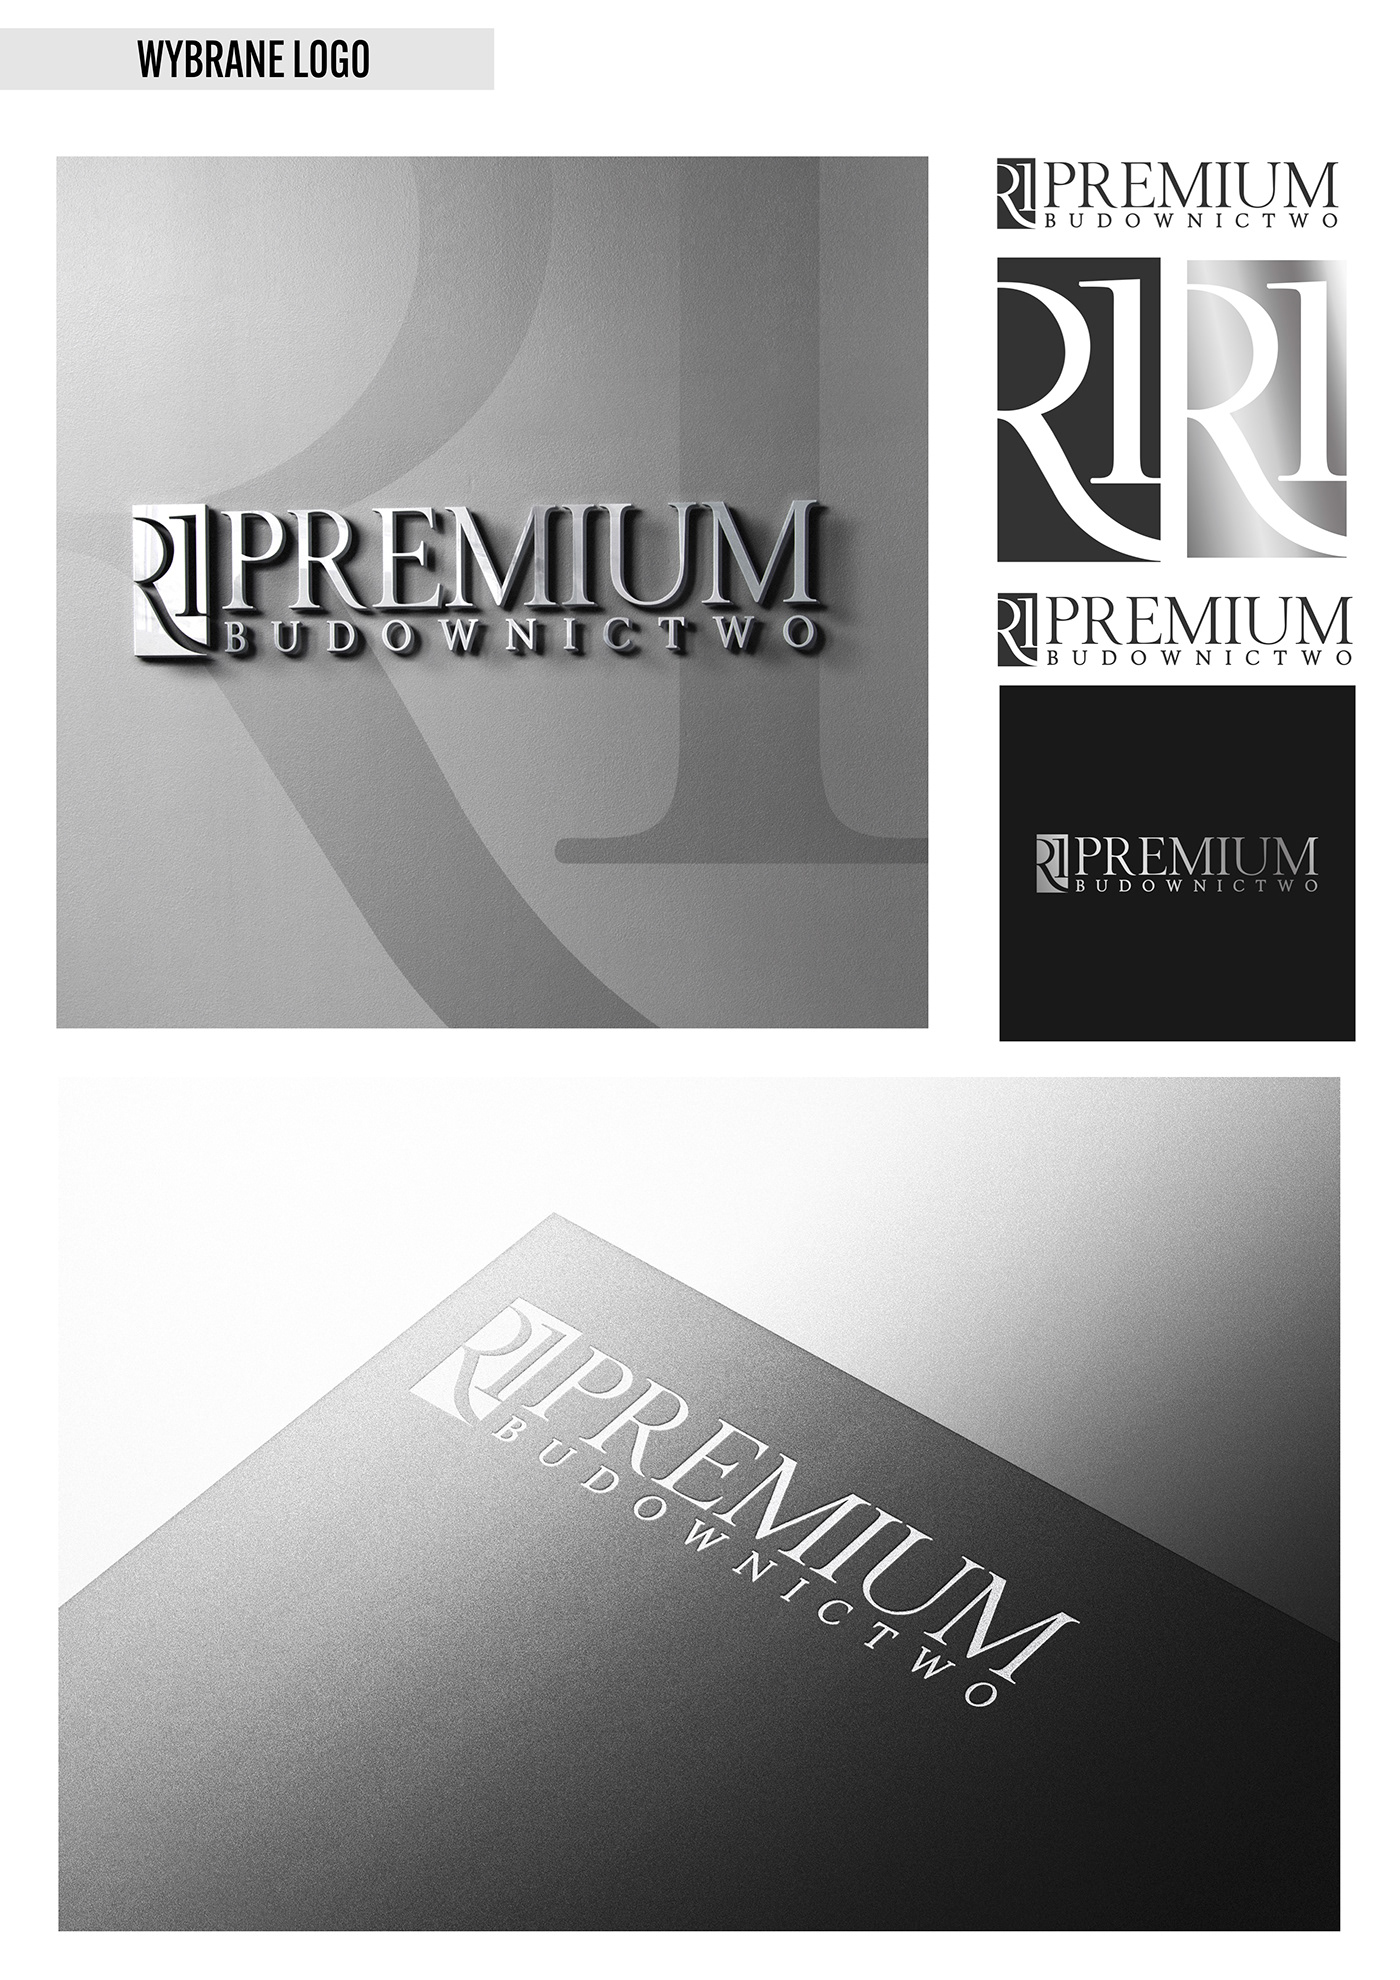 logo, mockup, development, plan, system, architecture, build, branding, design